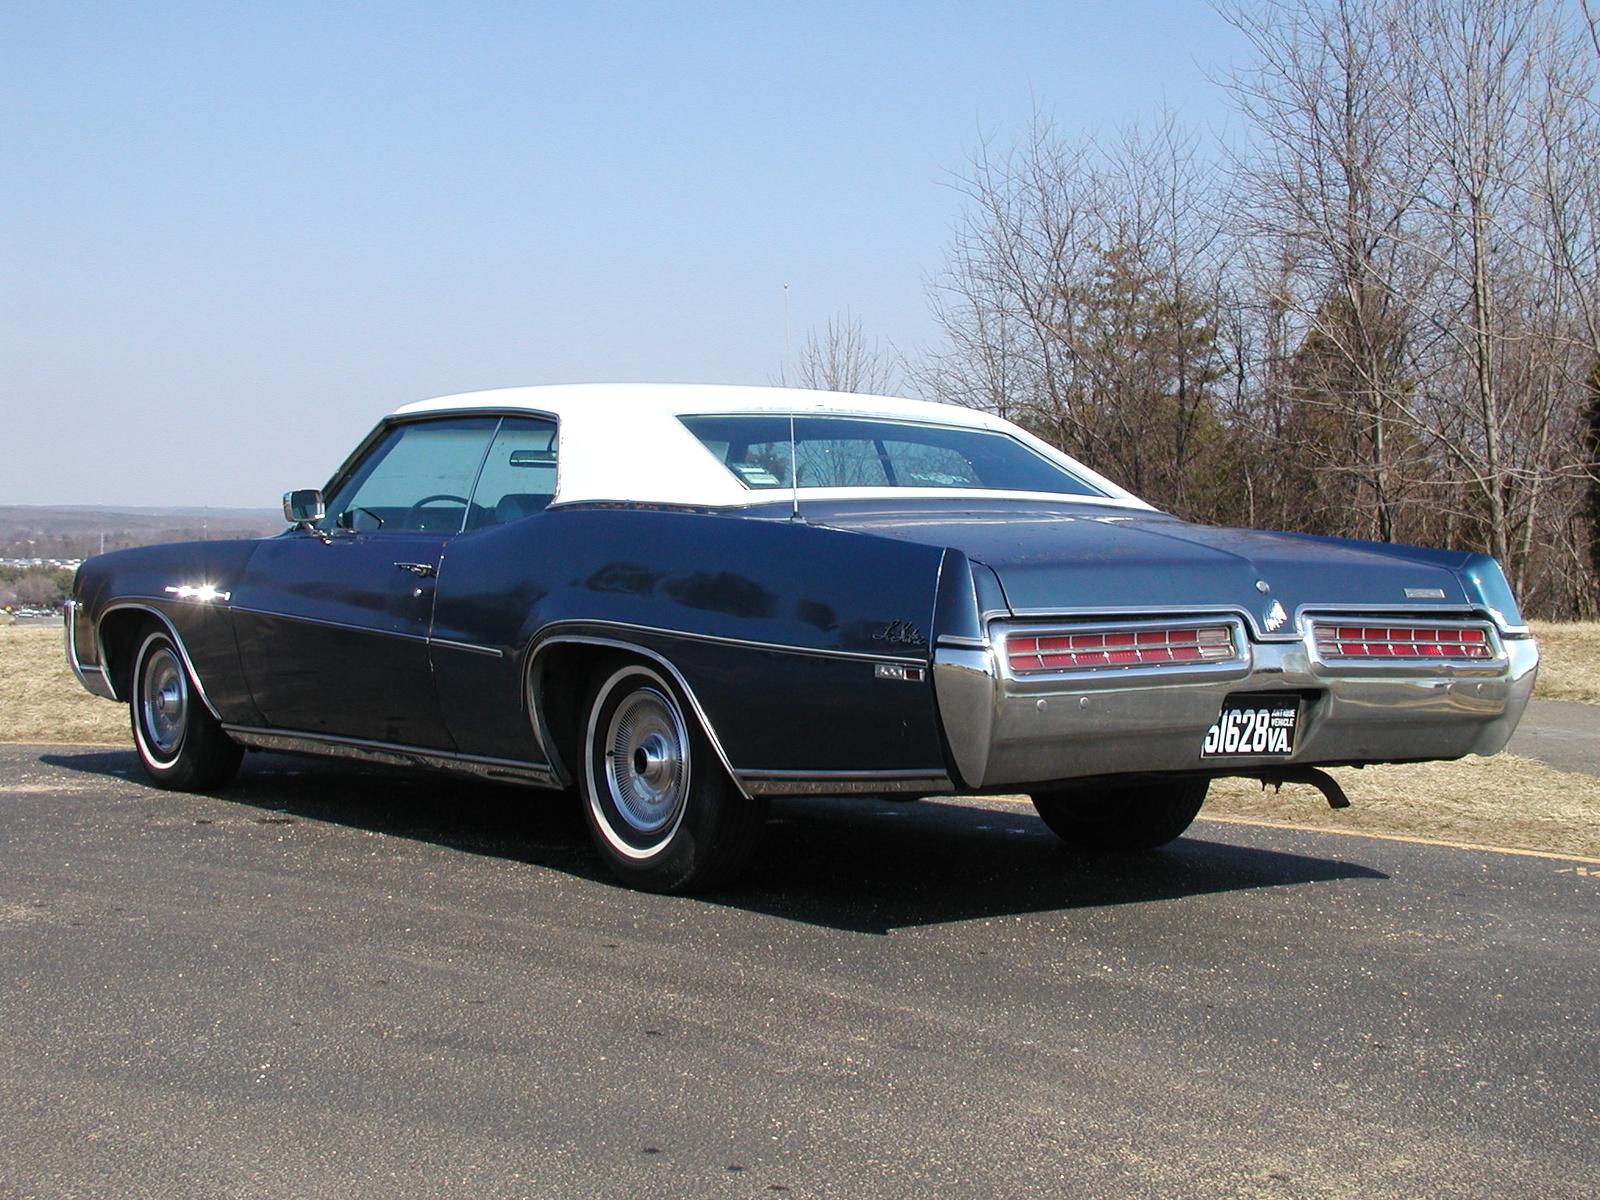 1969 Buick LeSabre - Overview - CarGurus